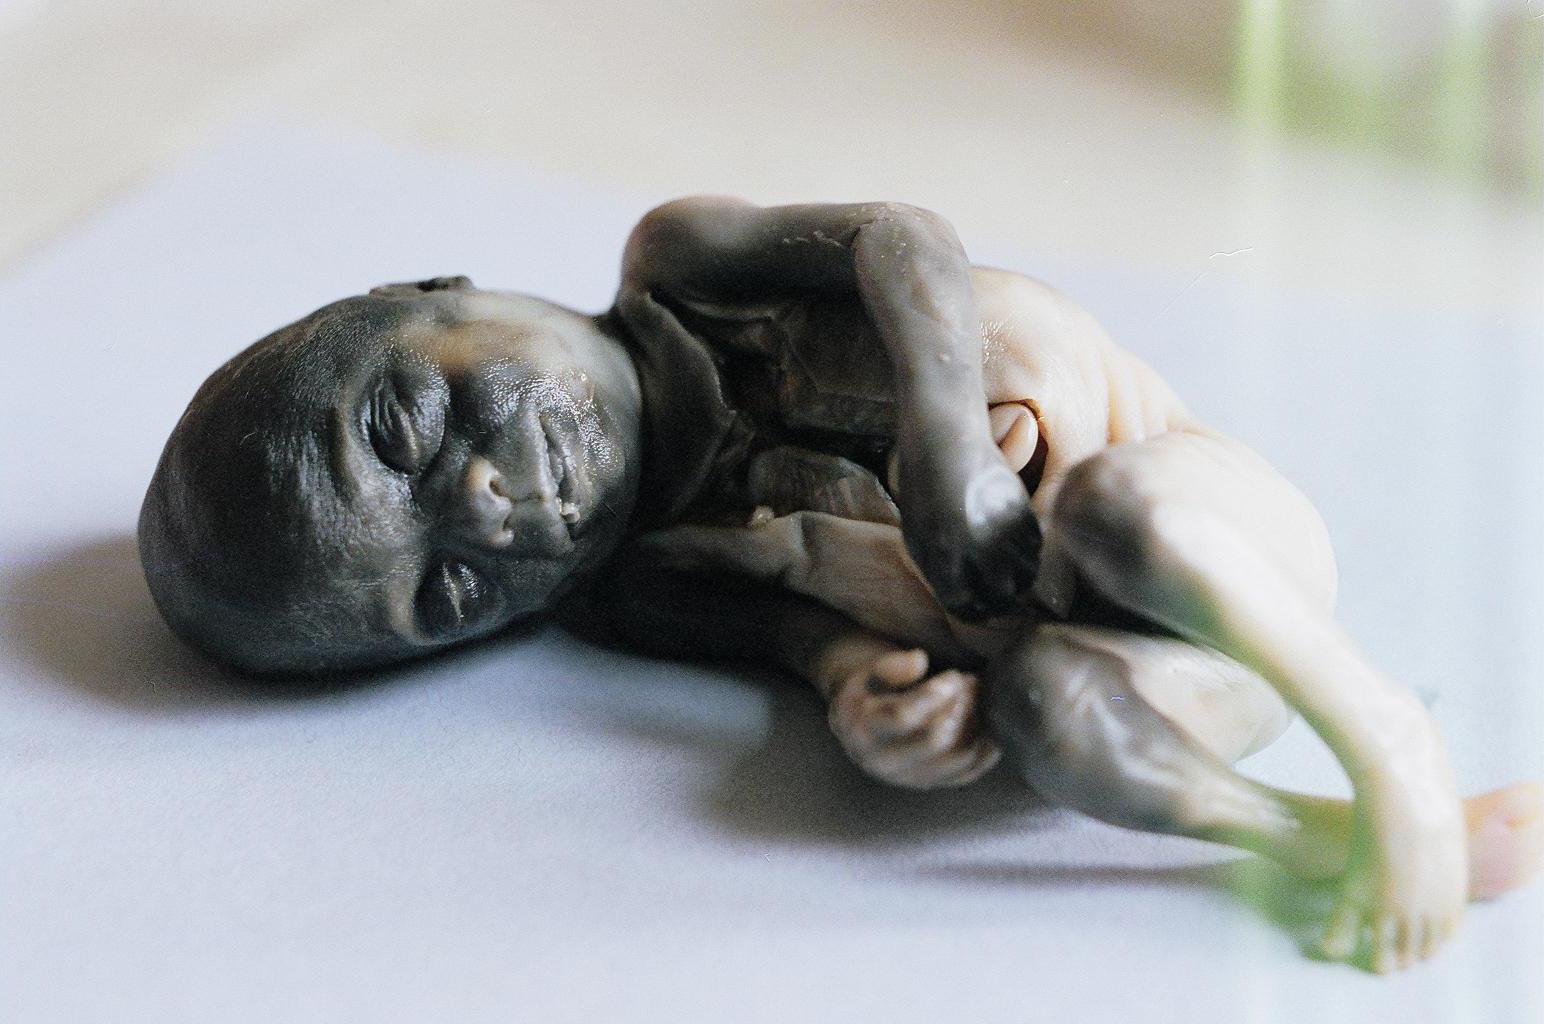 second trimester abortion victim 2